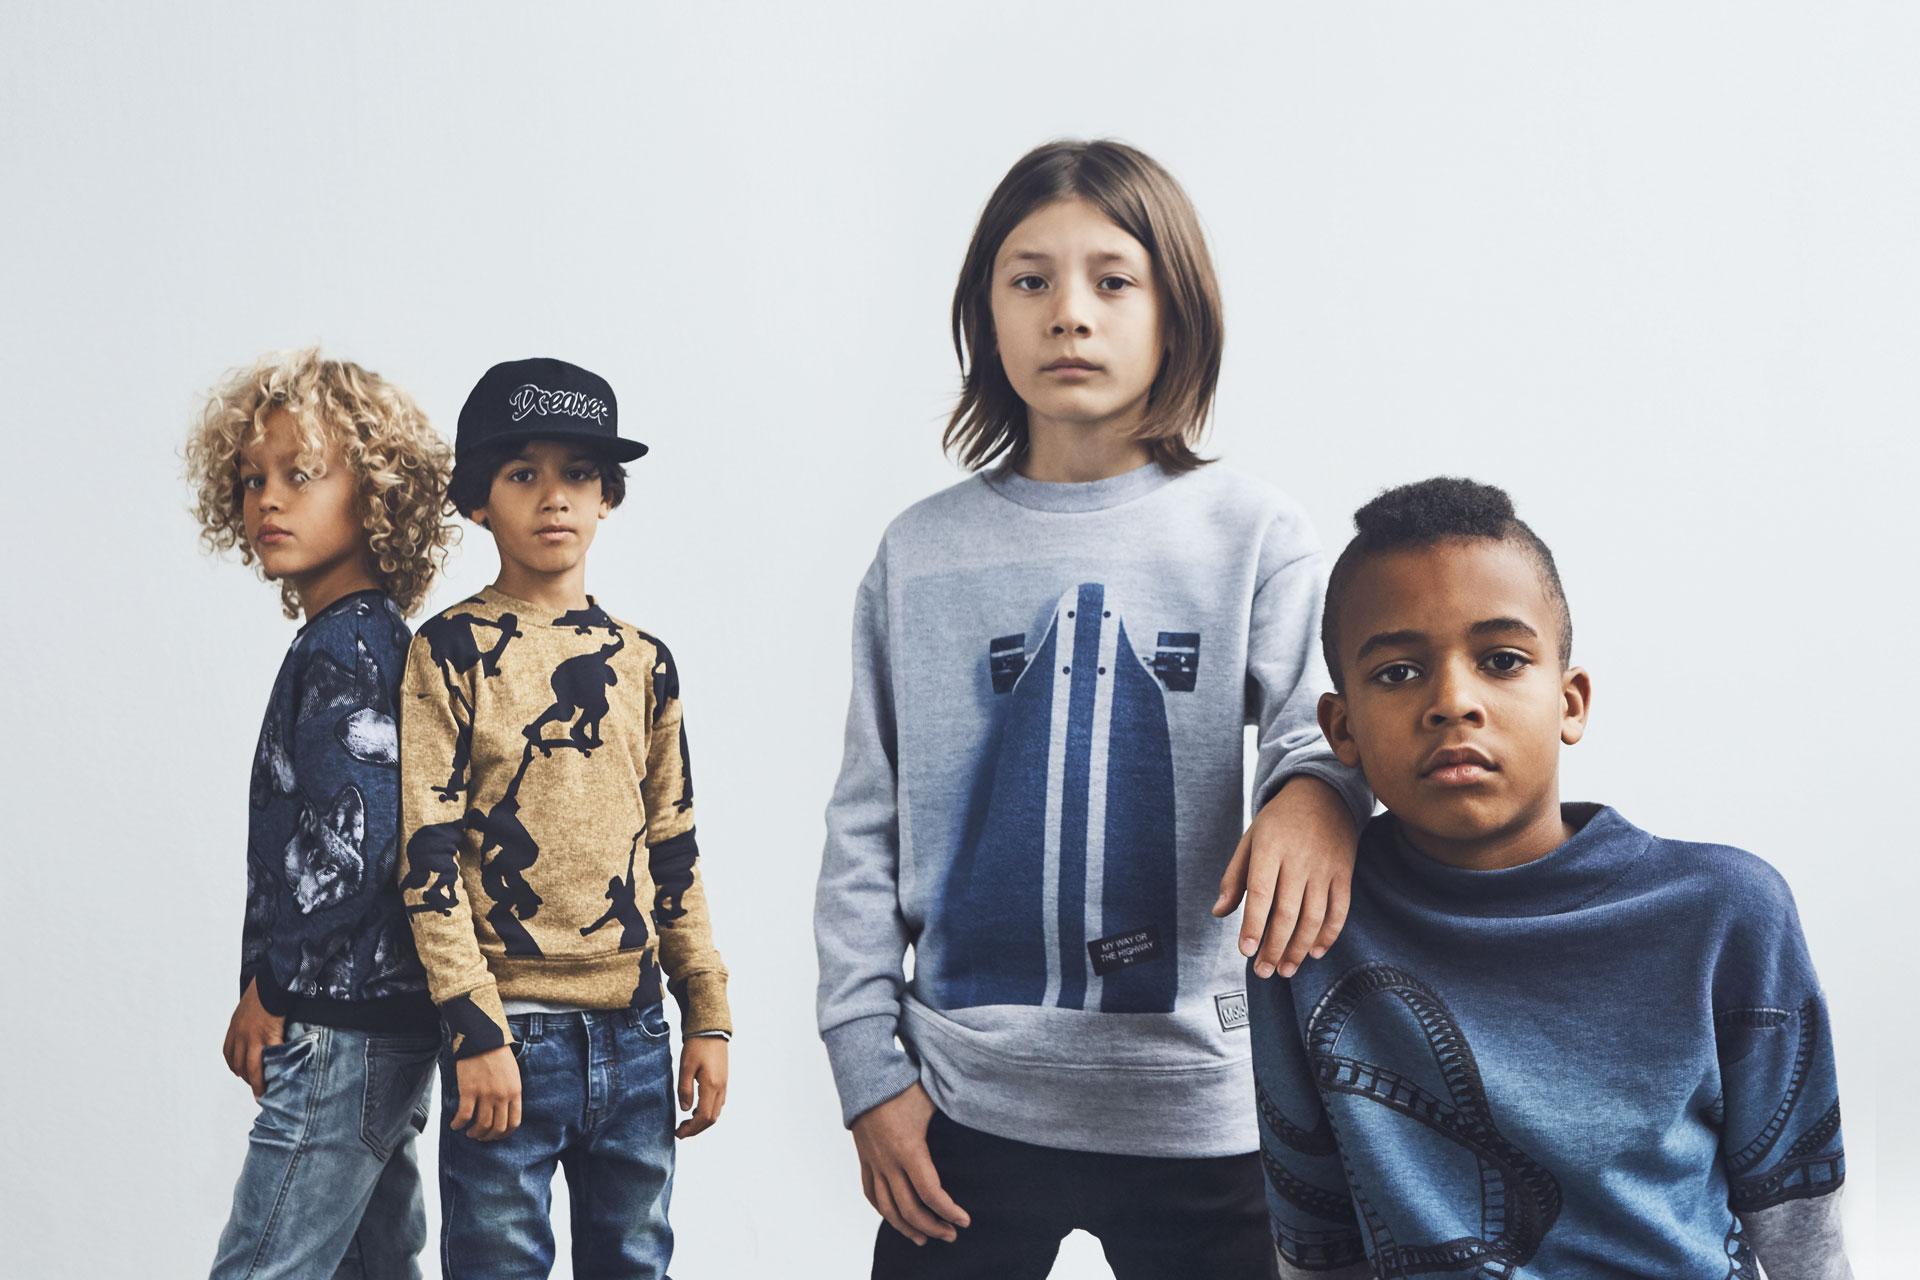 Kinderkleding Jongens.Kinderkleding Voor Jongens Stars Of Tomorrow